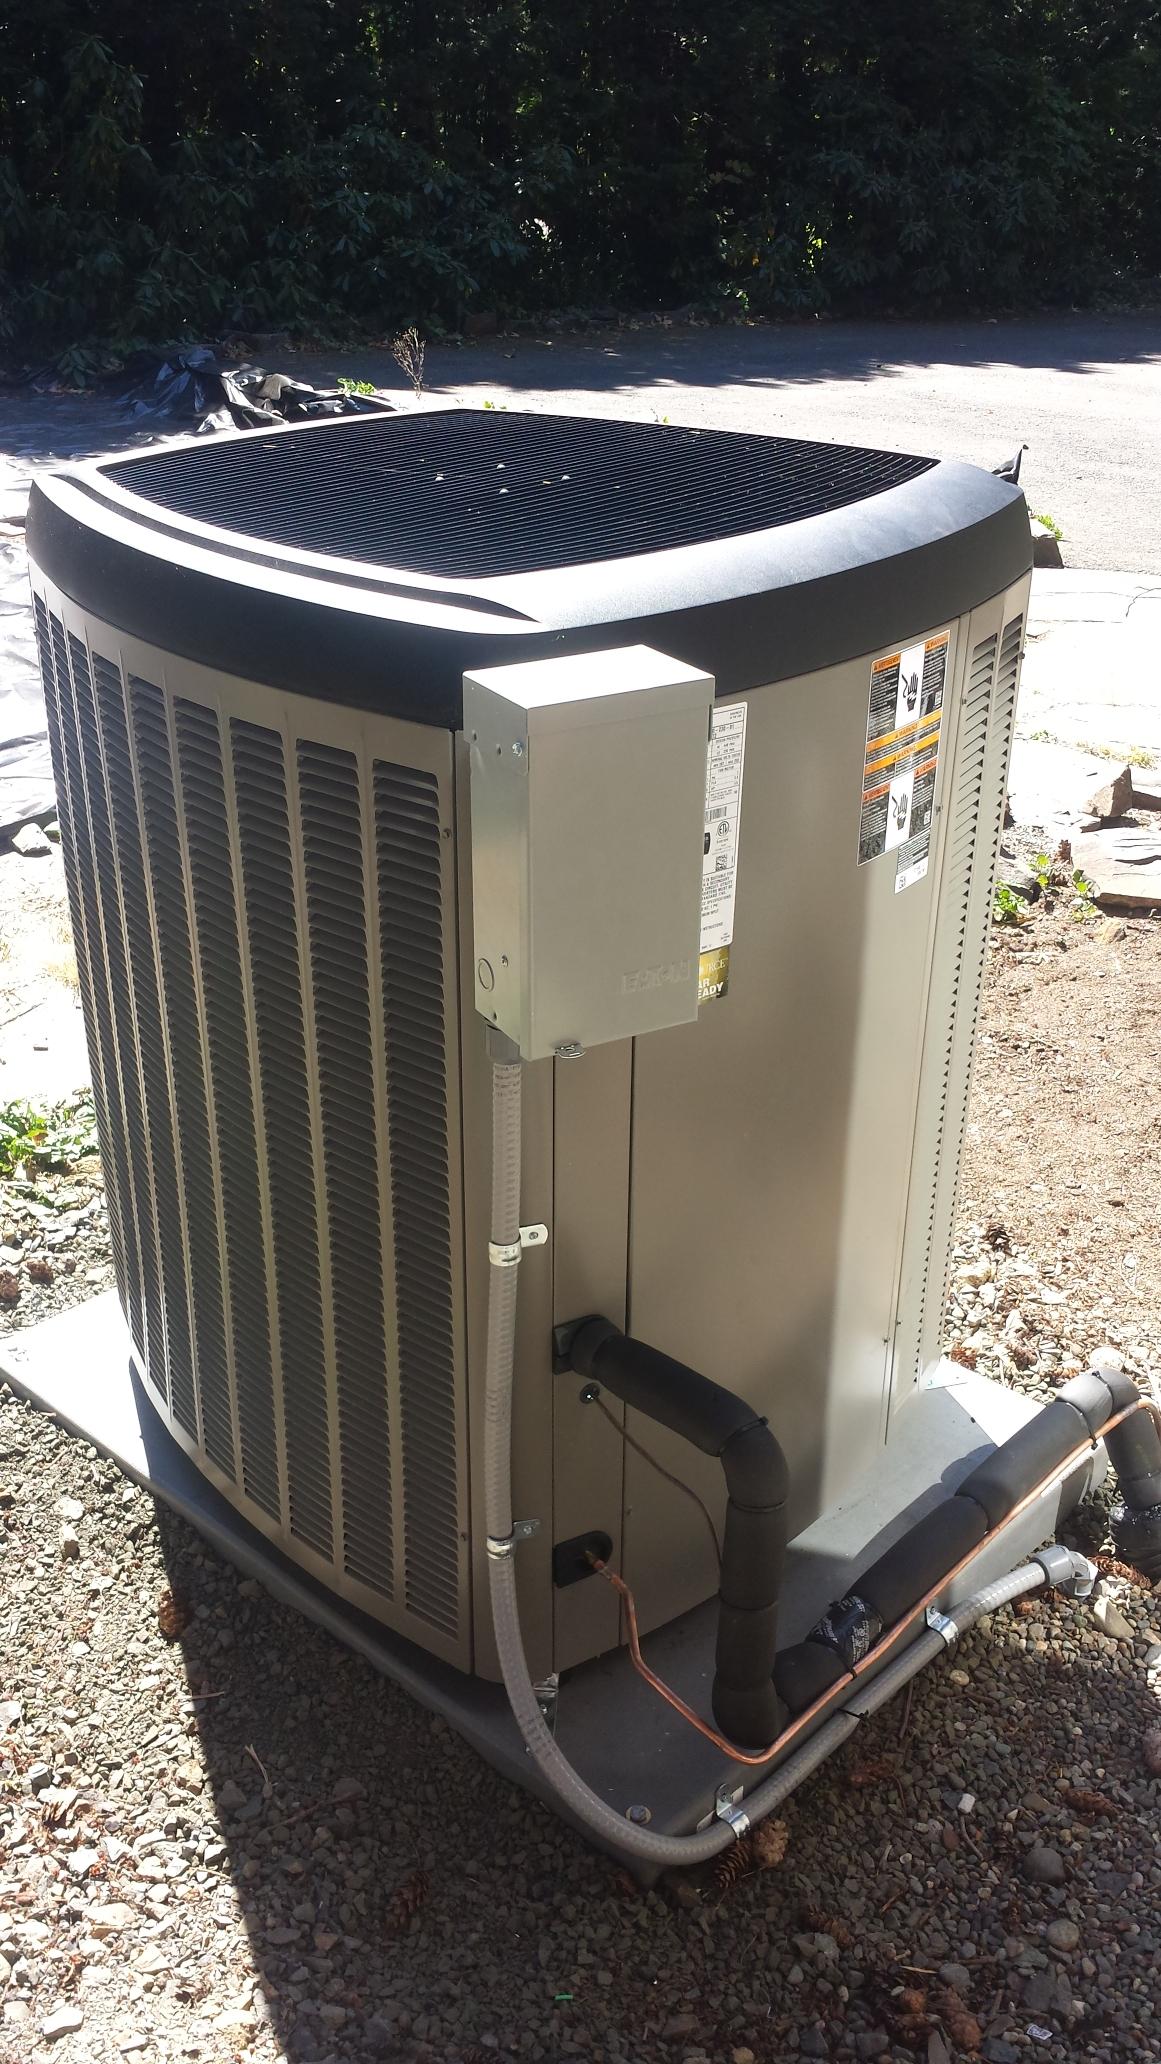 Edmonds, WA - Competed a warranty repair on a Lennox heat pump in Edmonds